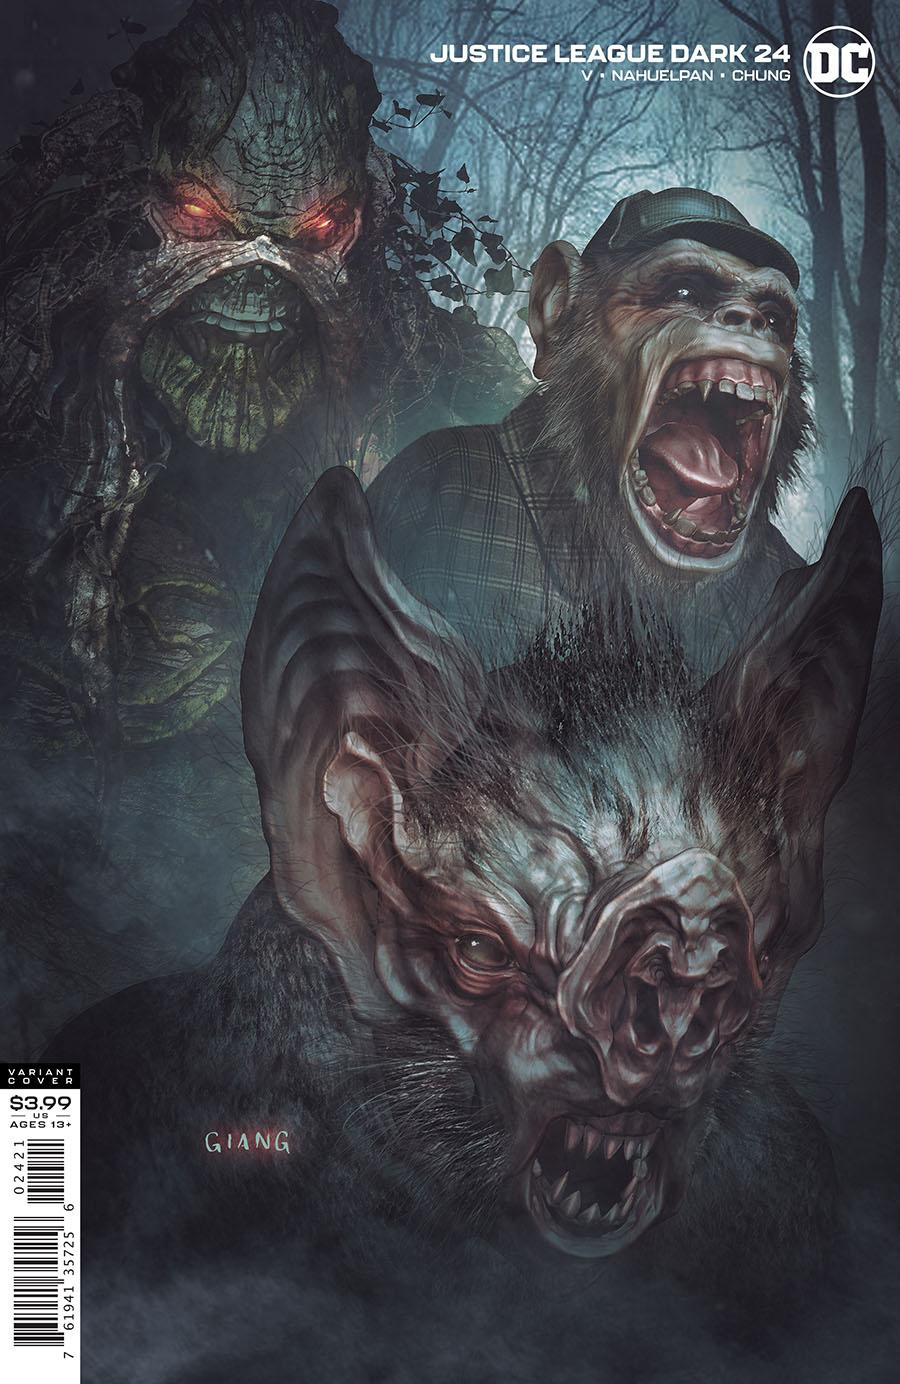 Justice League Dark Vol 2 #24 Cover B Variant John Giang Cover